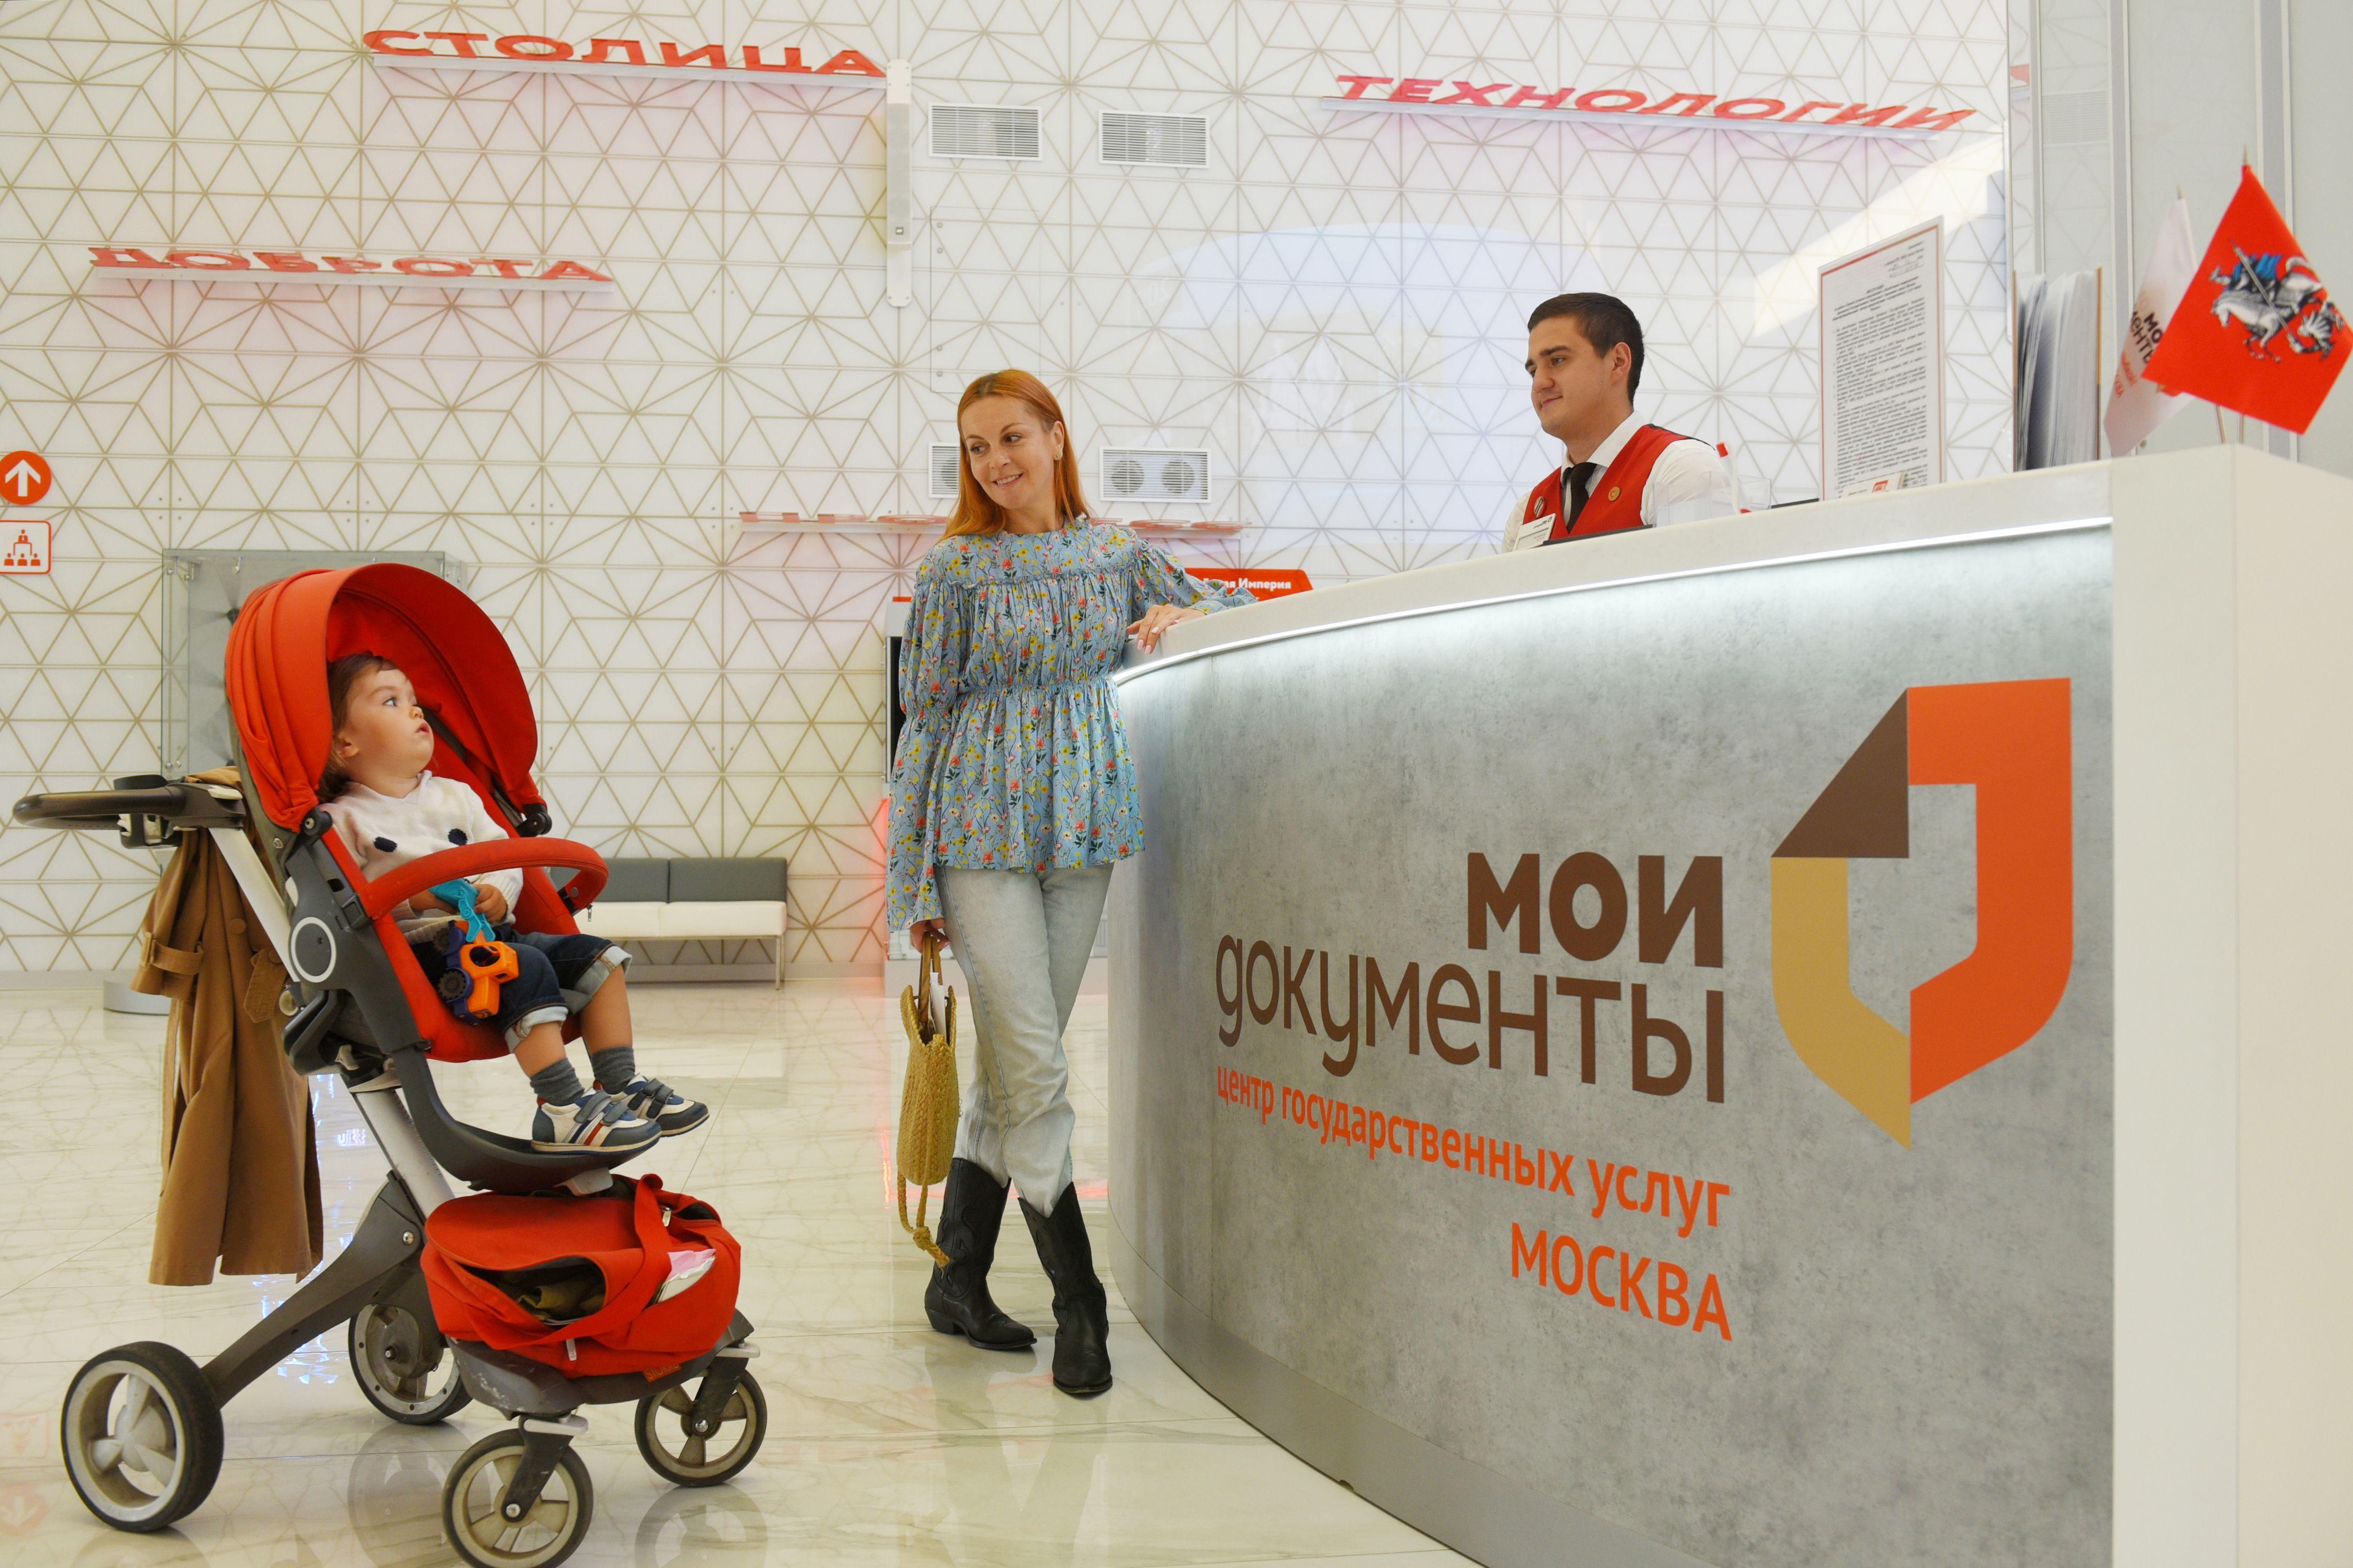 Центры госуслуг работают без выходных. Фото:Александр Кожохин